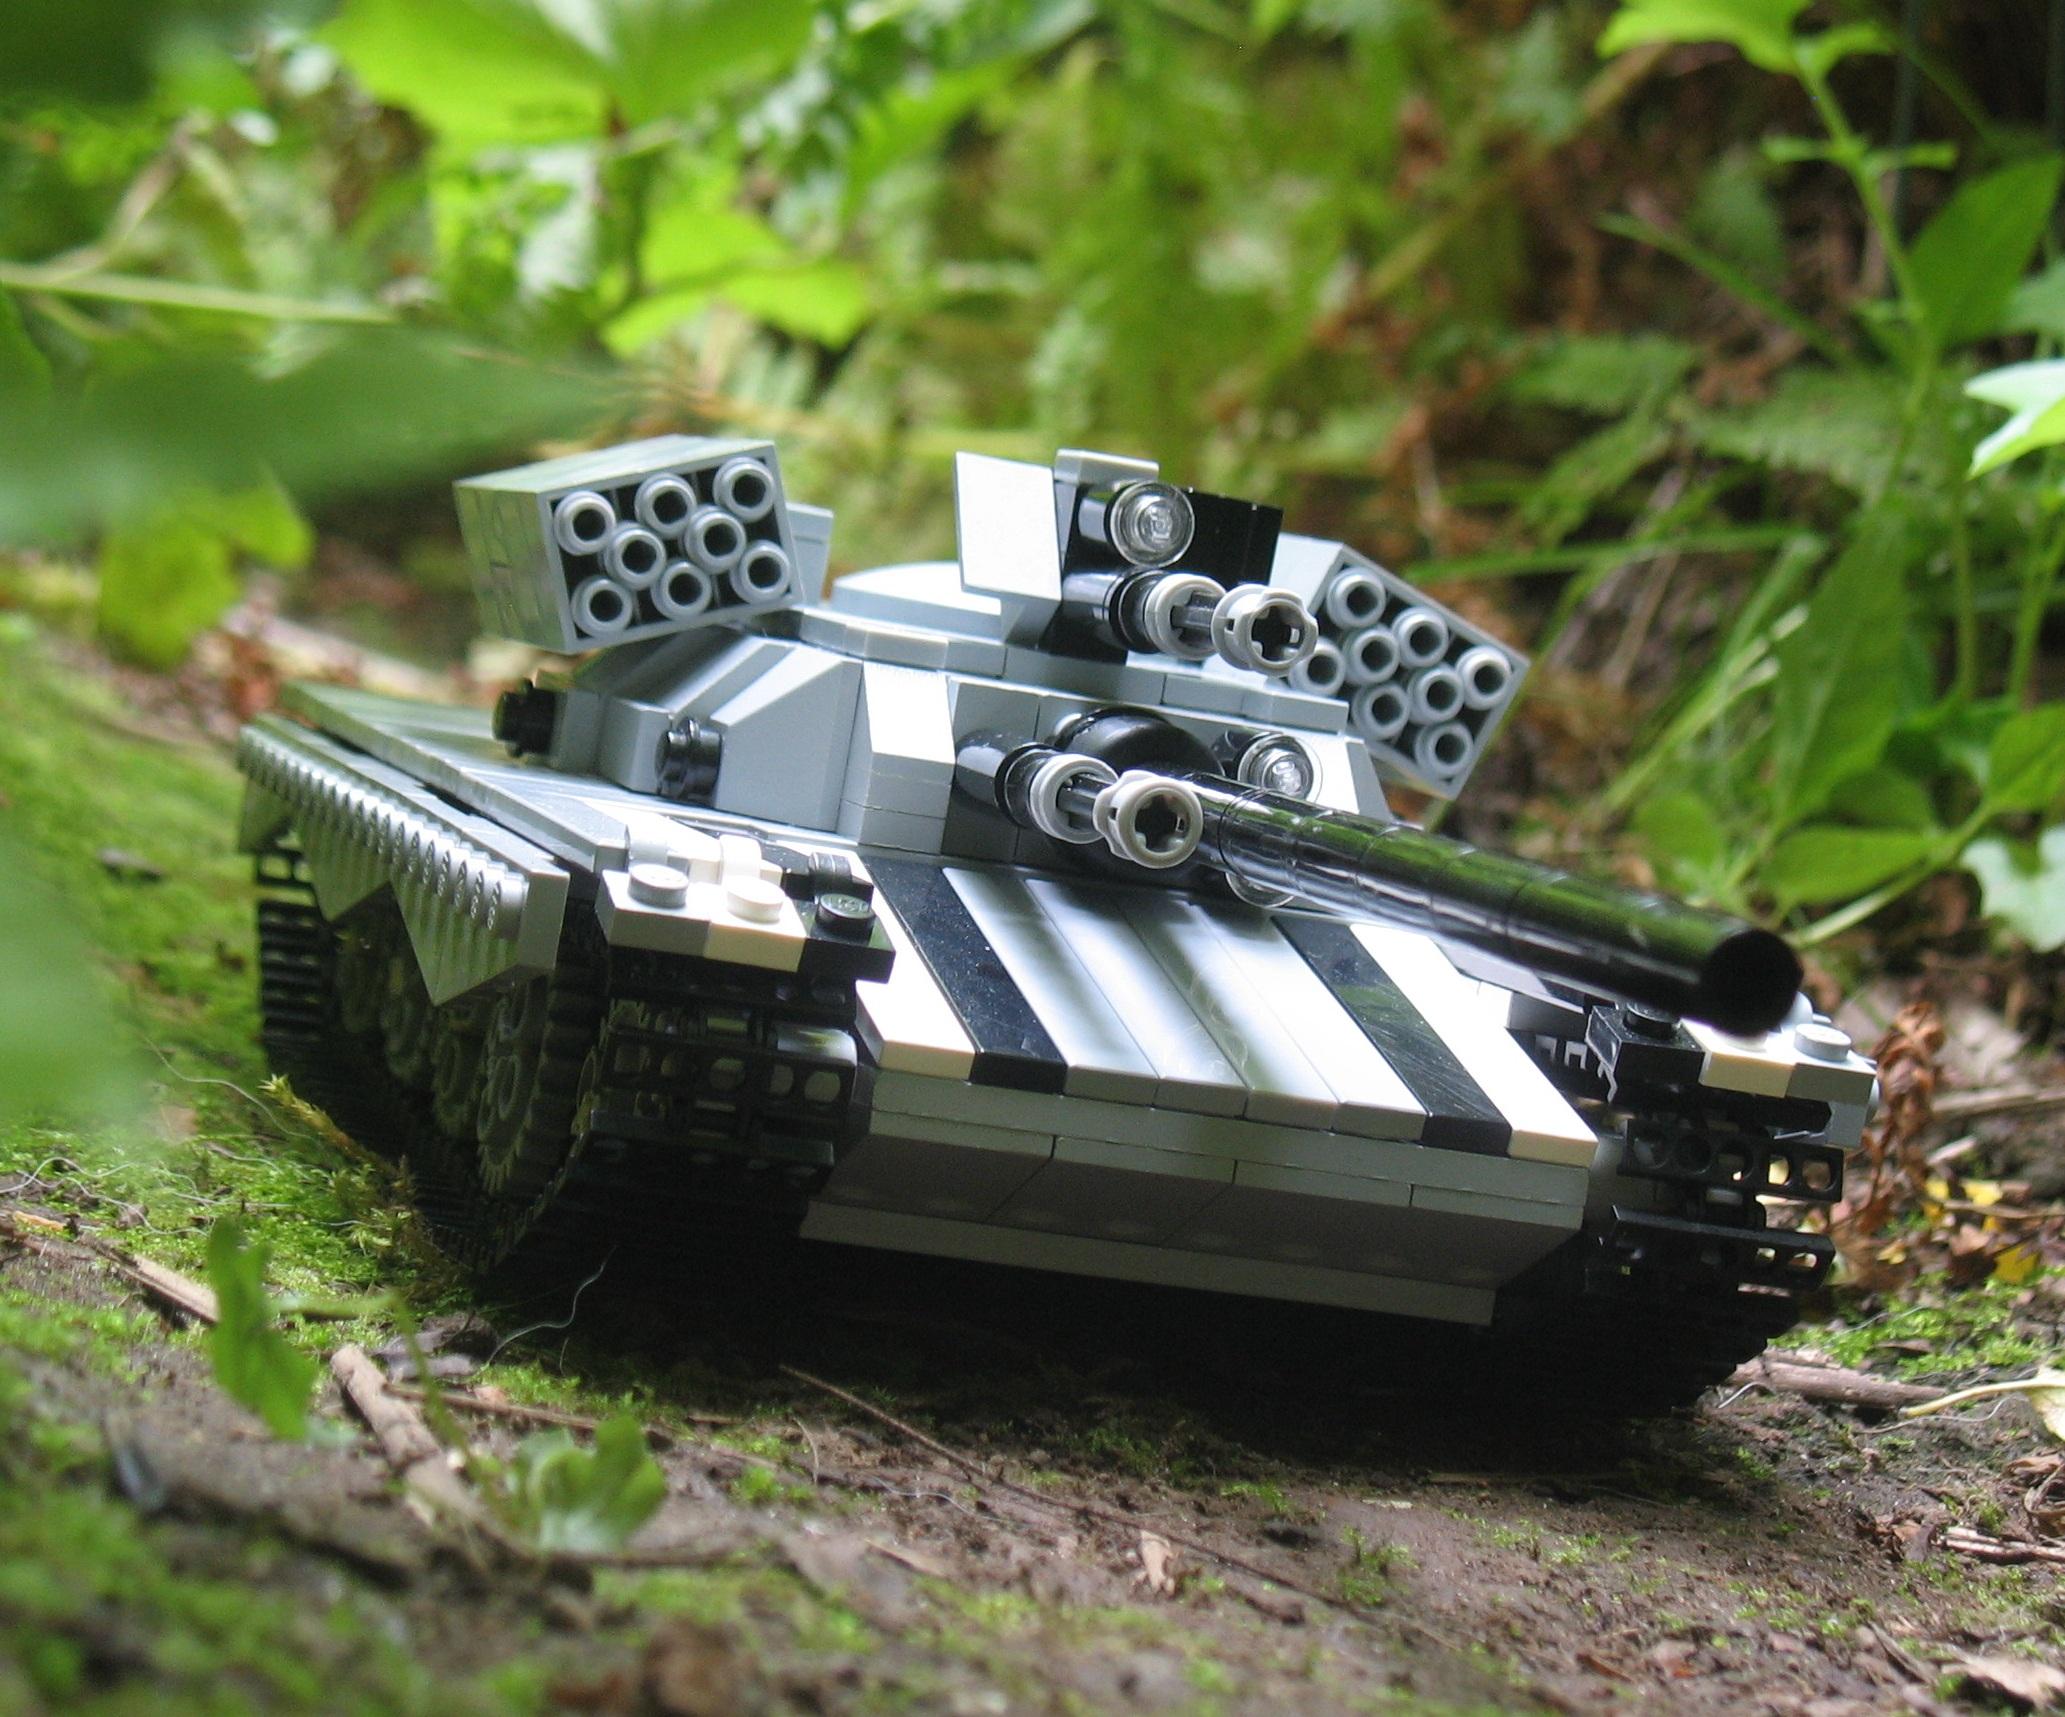 сборка лего танков фото дизайн квартир